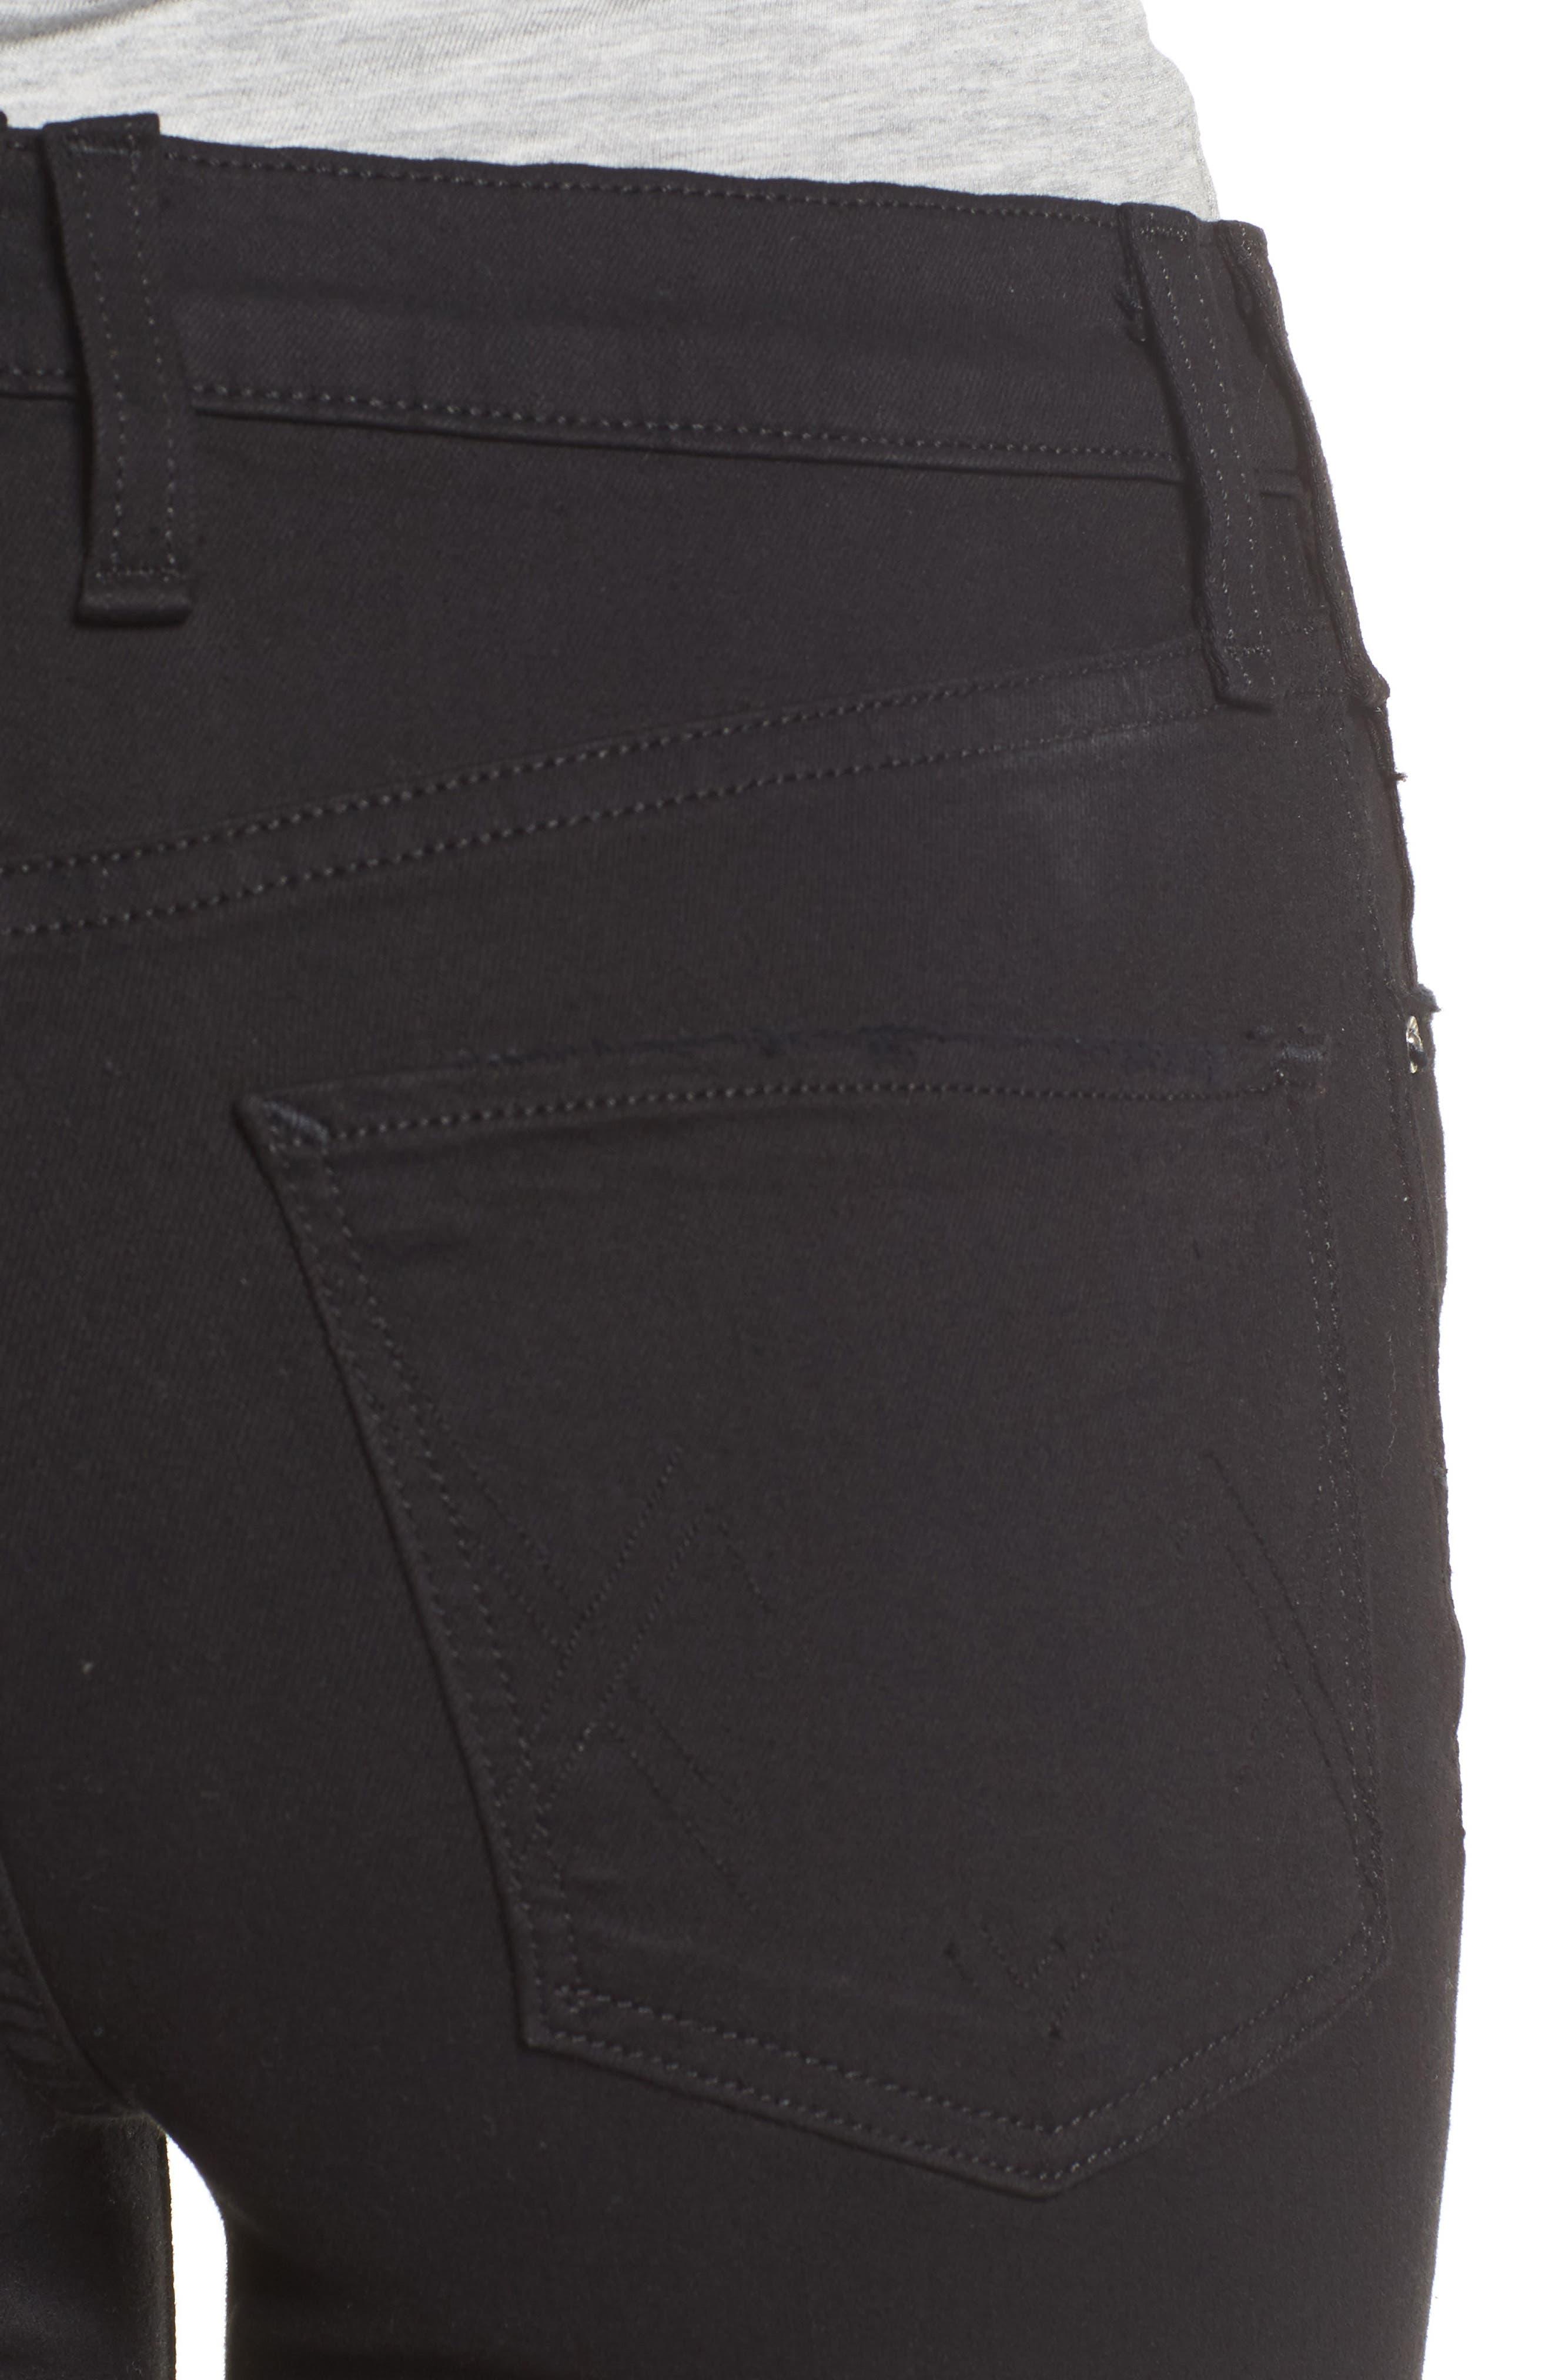 Newton High Waist Ankle Skinny Jeans,                             Alternate thumbnail 4, color,                             001